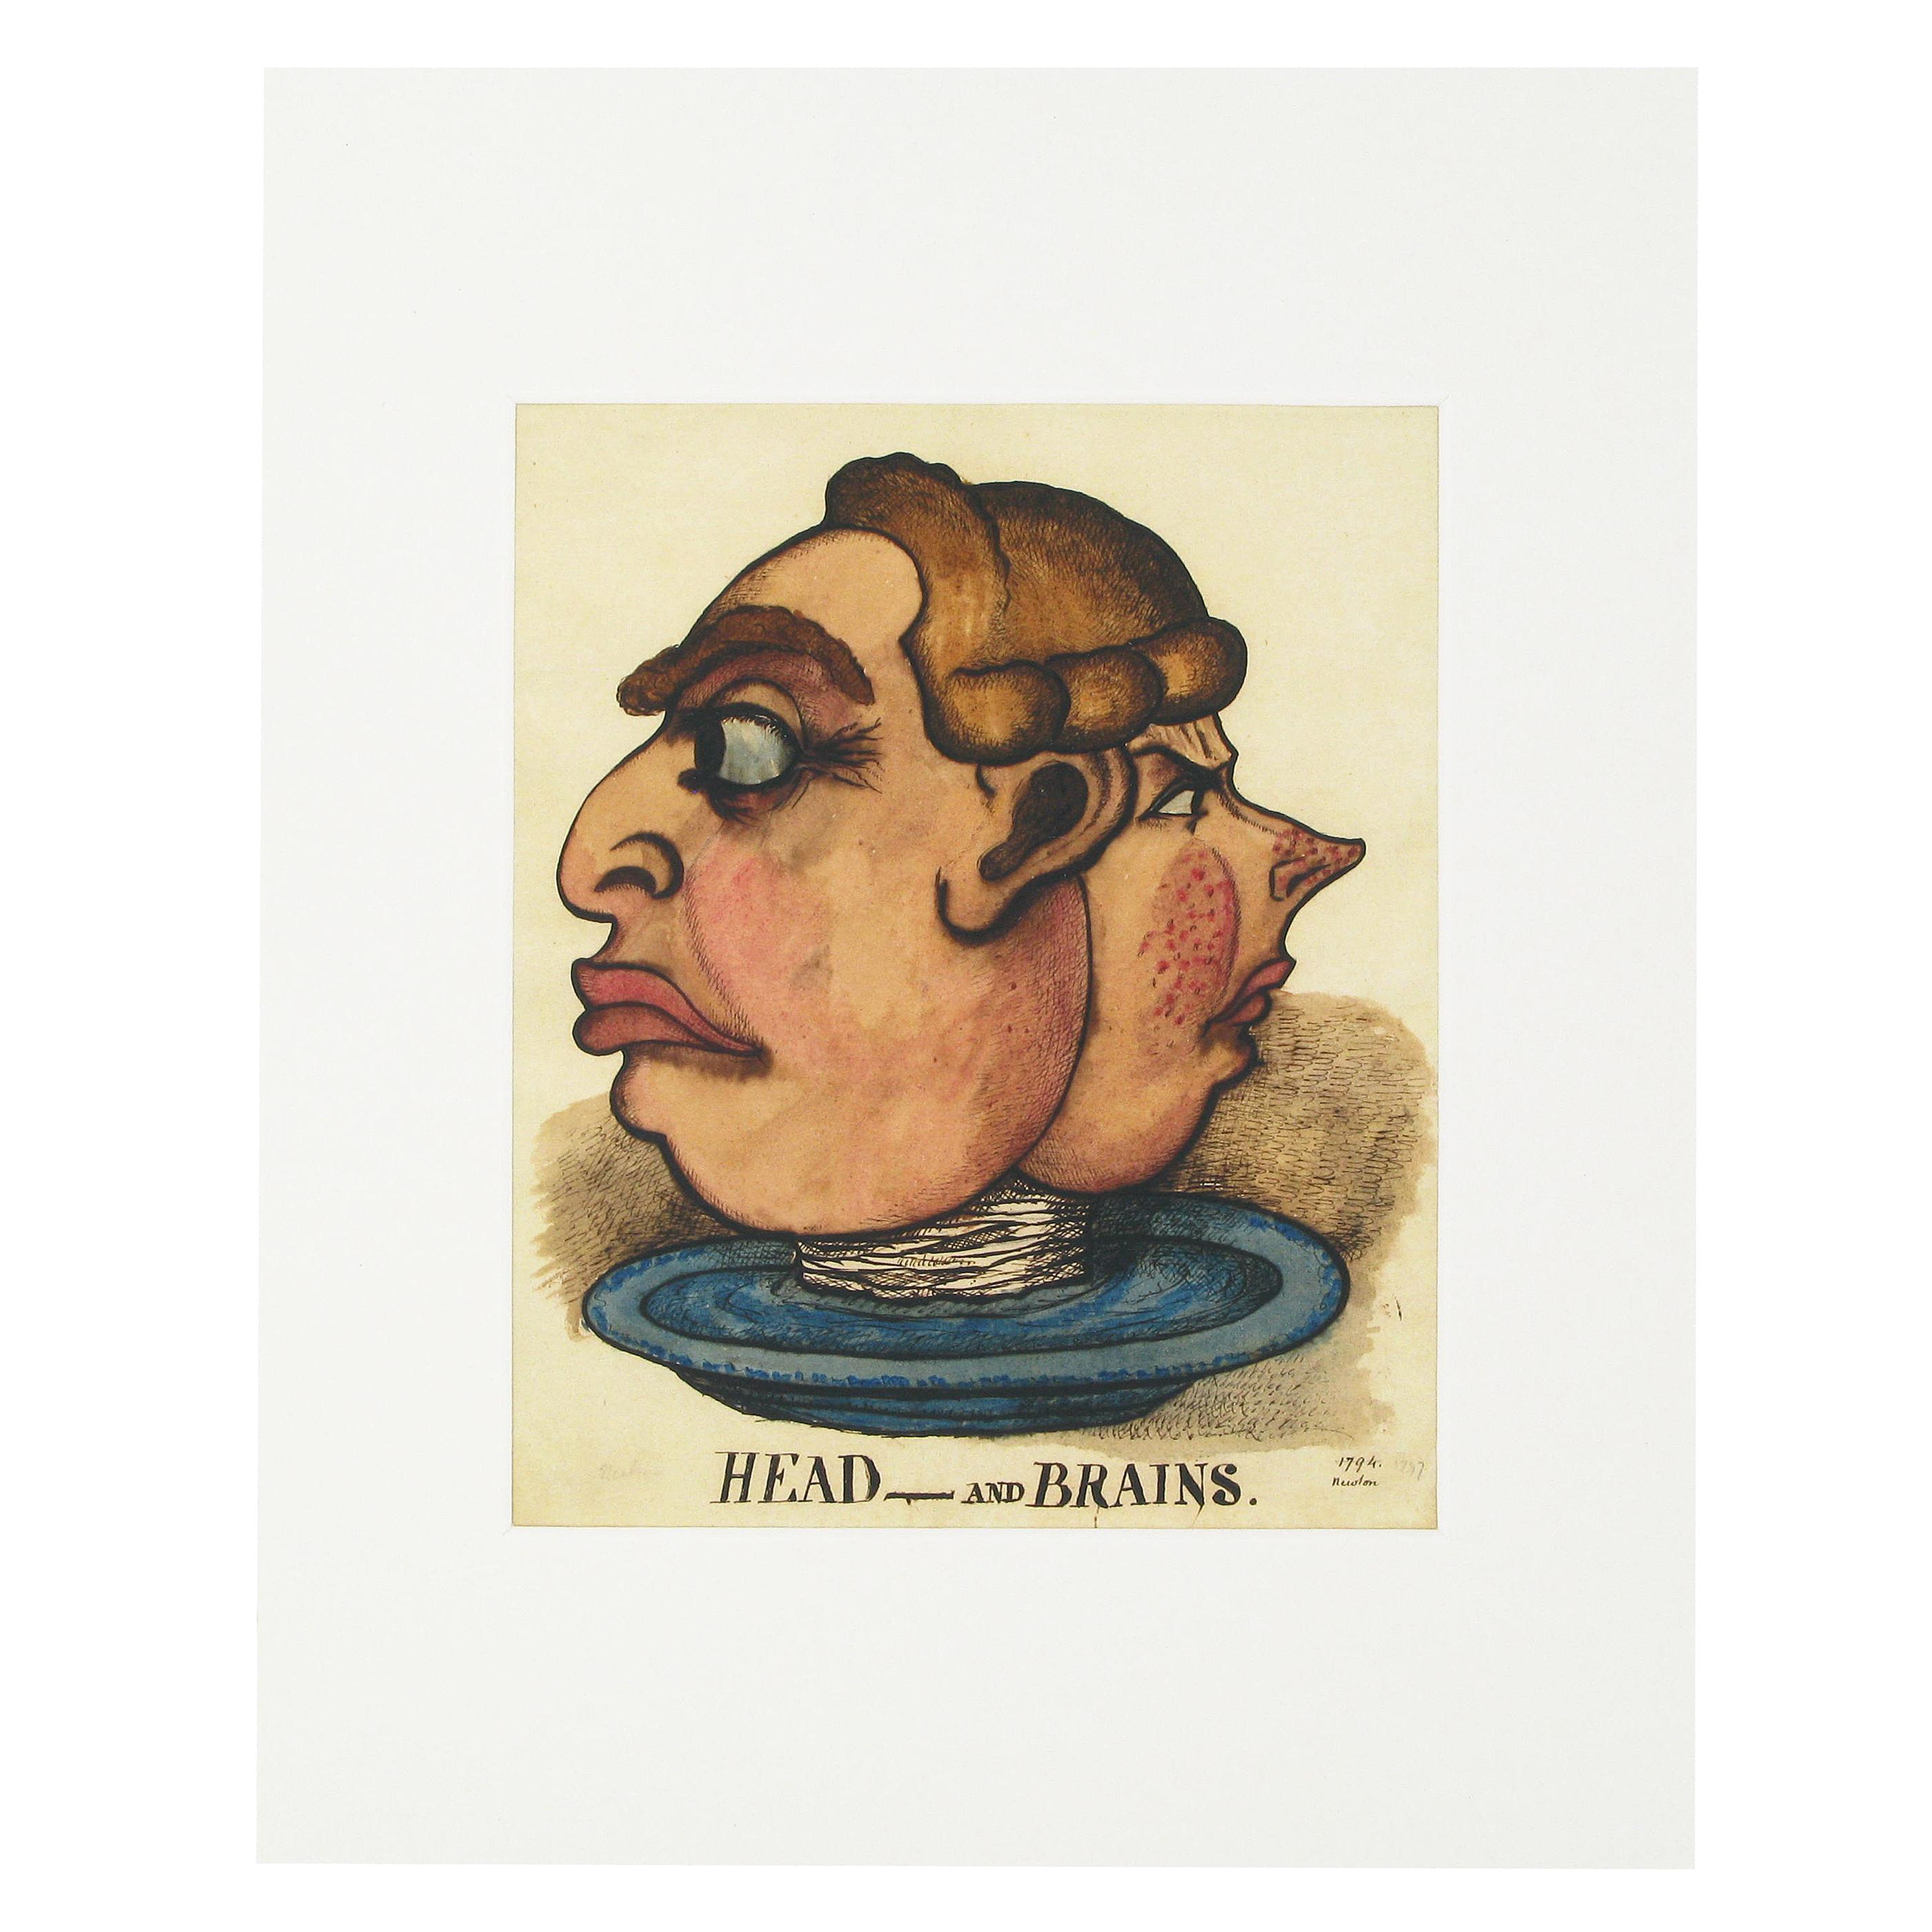 Head and Brains print